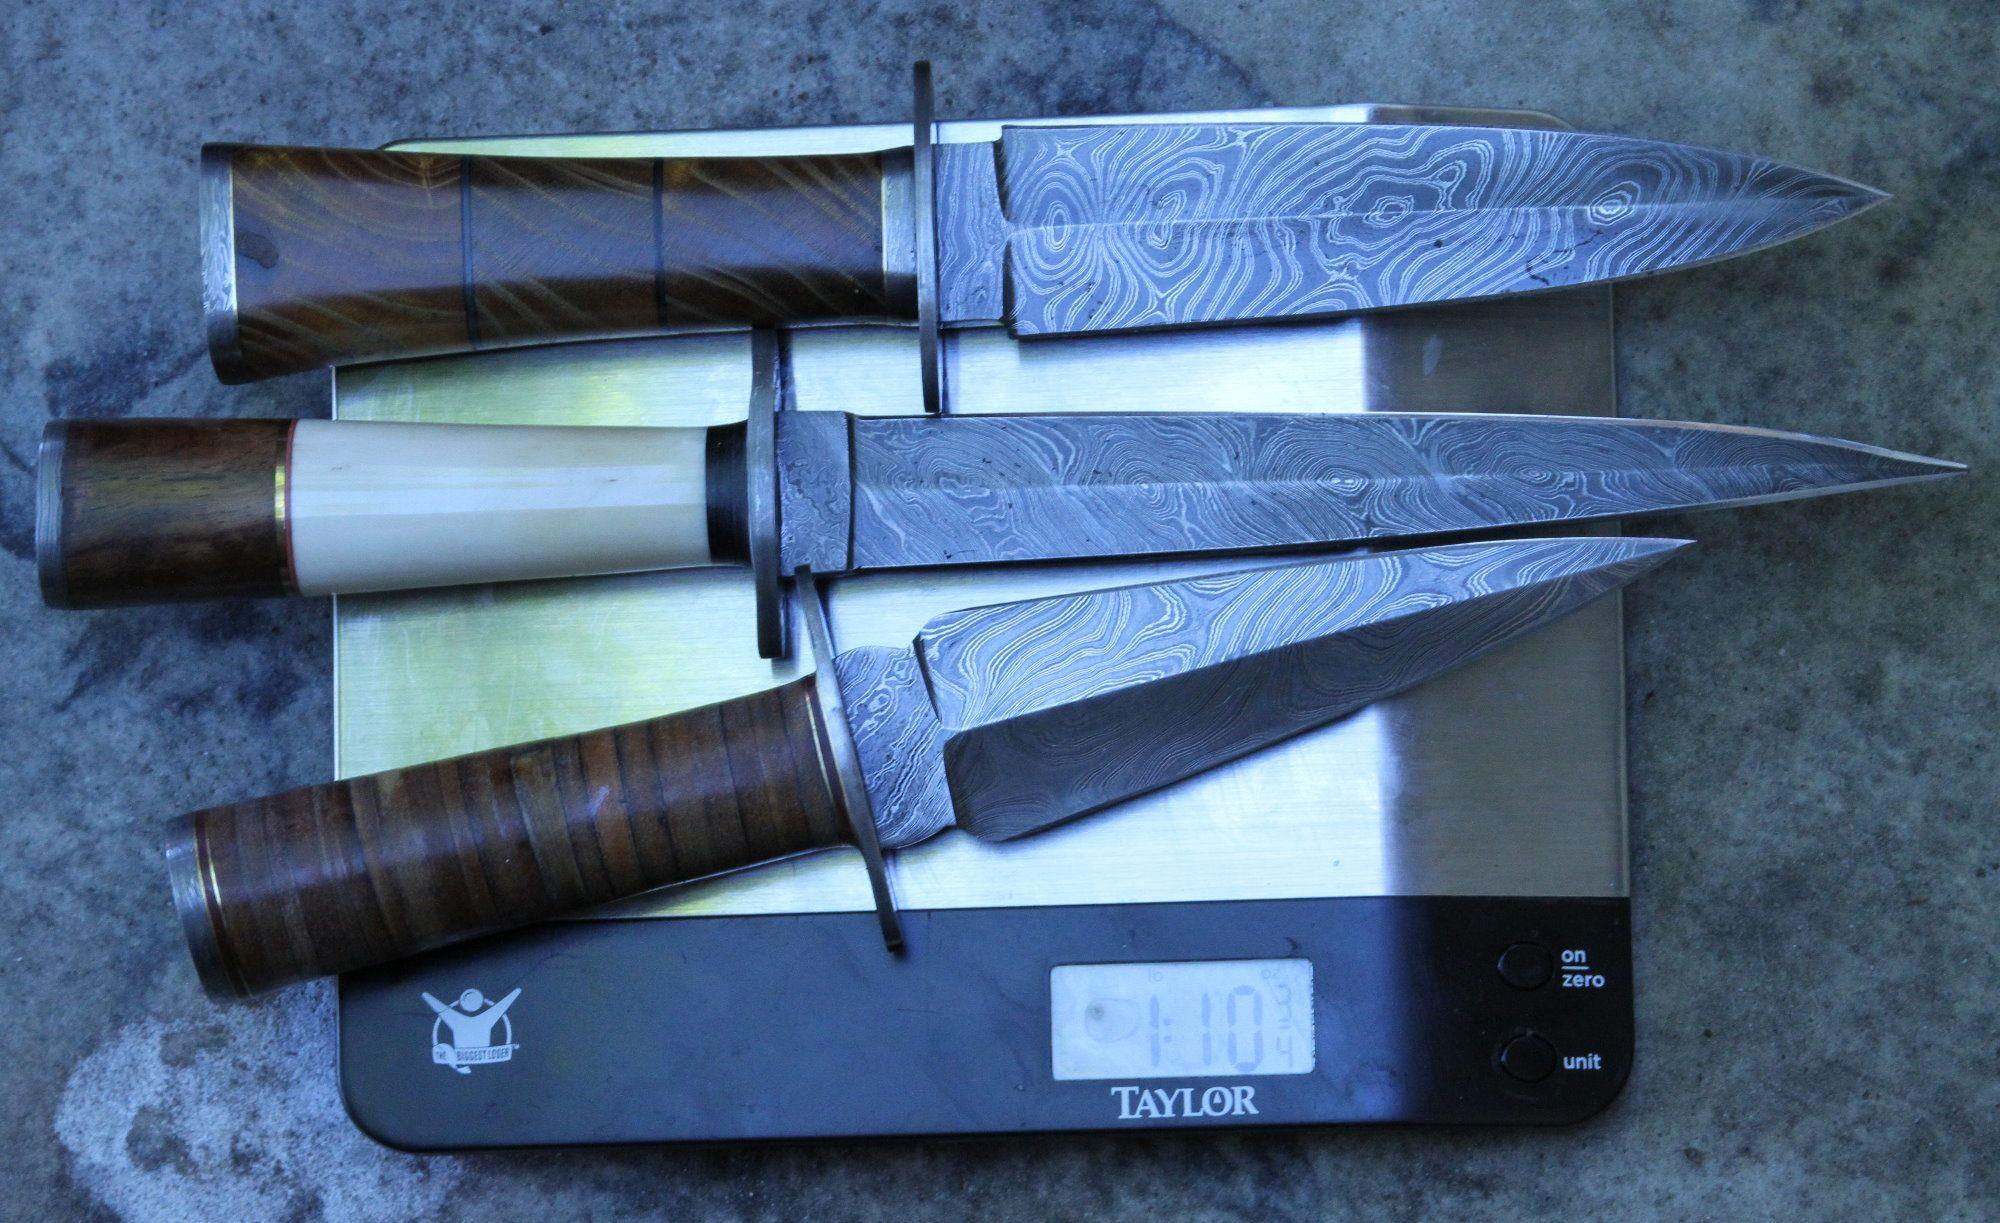 Cheap damascus knives for christmas gunsamerica digest knives